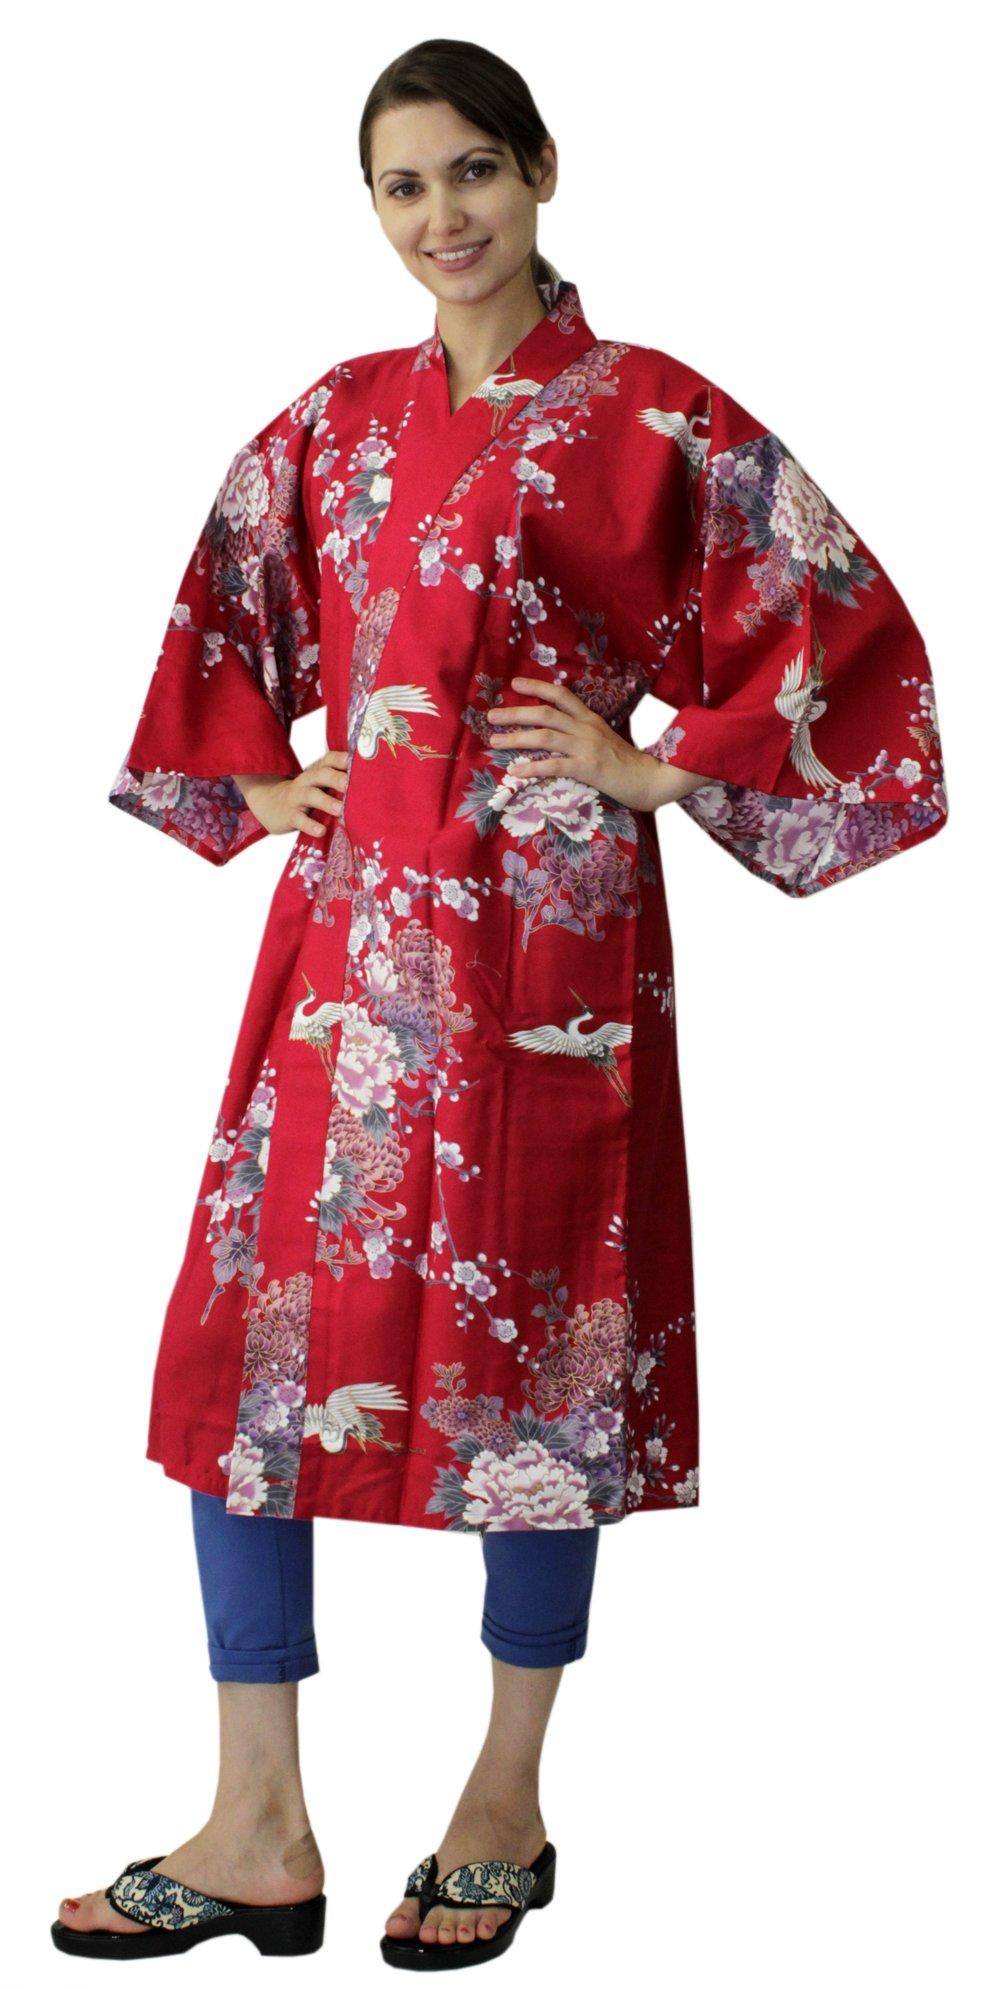 Japanese Women's Kimono Robe Happi Coat Dress Cotton Crane Peony Red